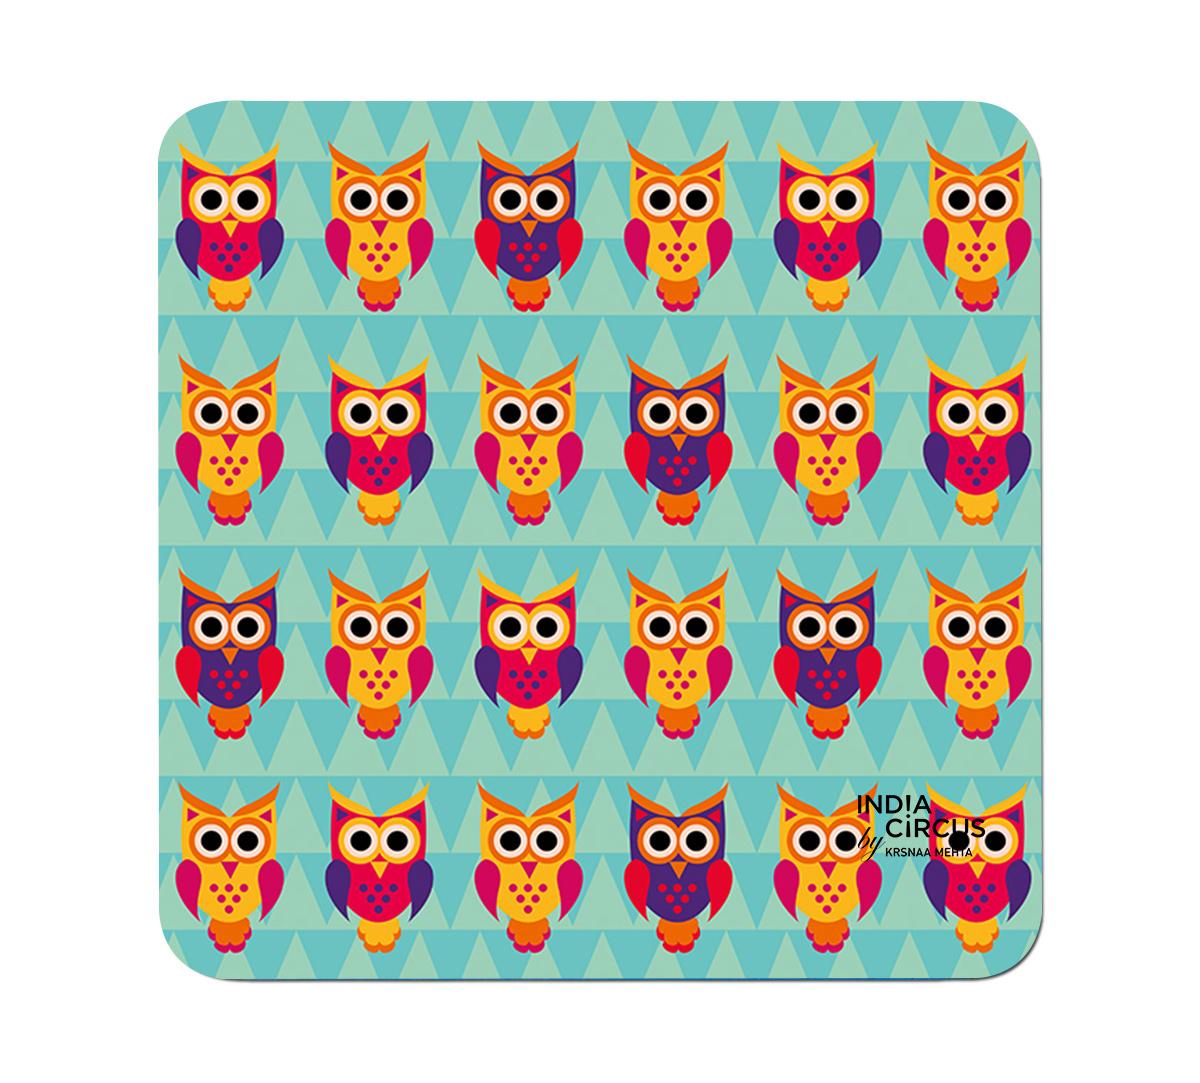 Disco Hedwig PVC Table Coaster (Set of 6)